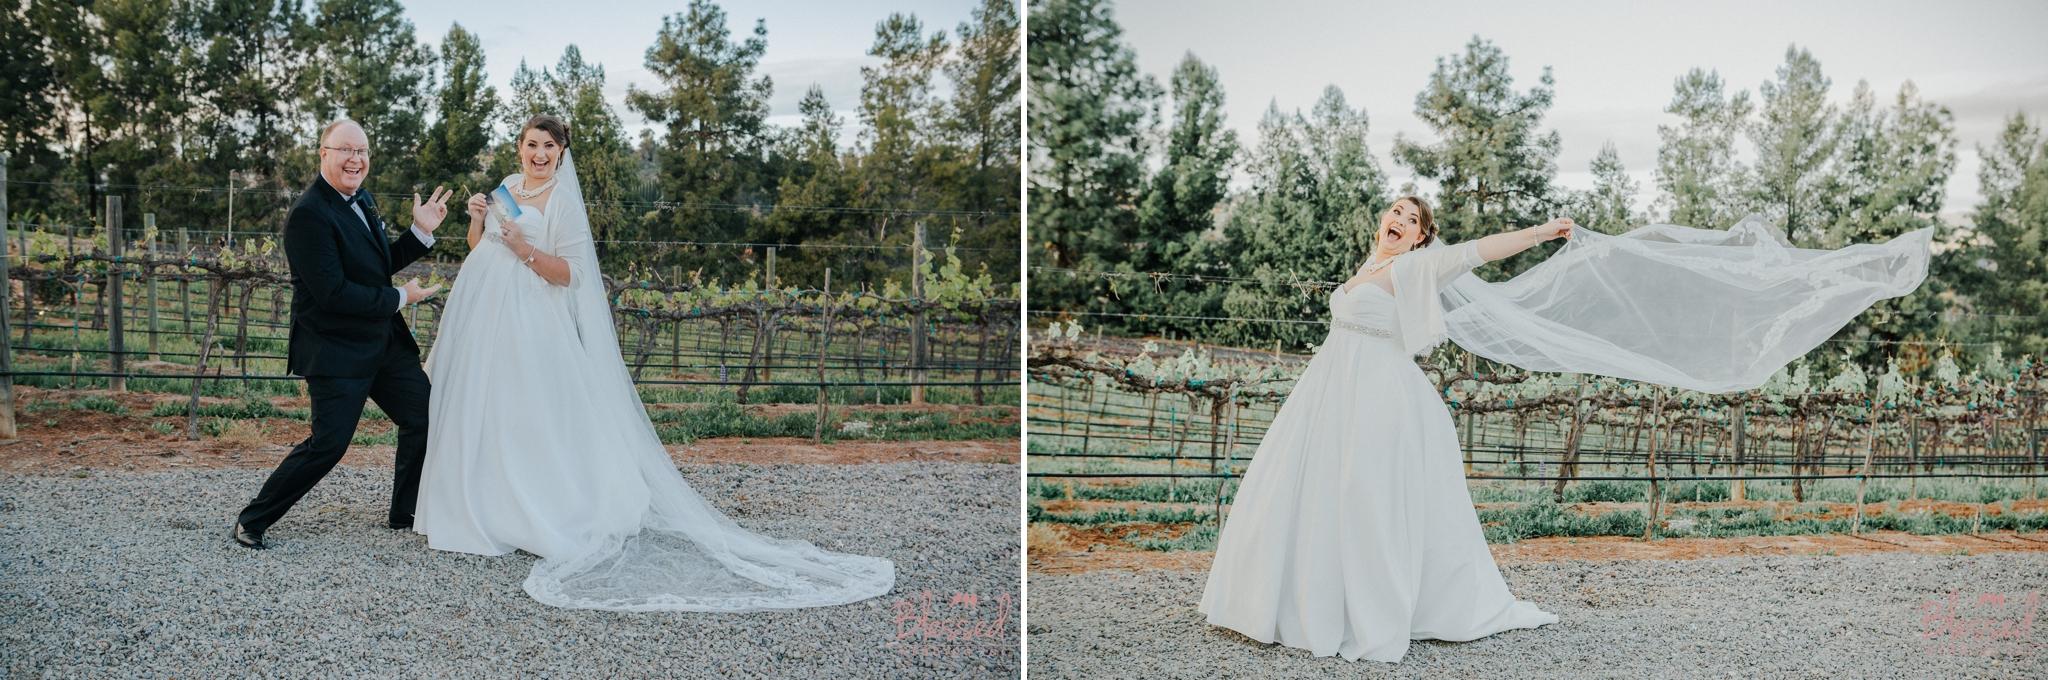 Orfila Vinery Wedding Temecula Wedding Photographer 25.jpg